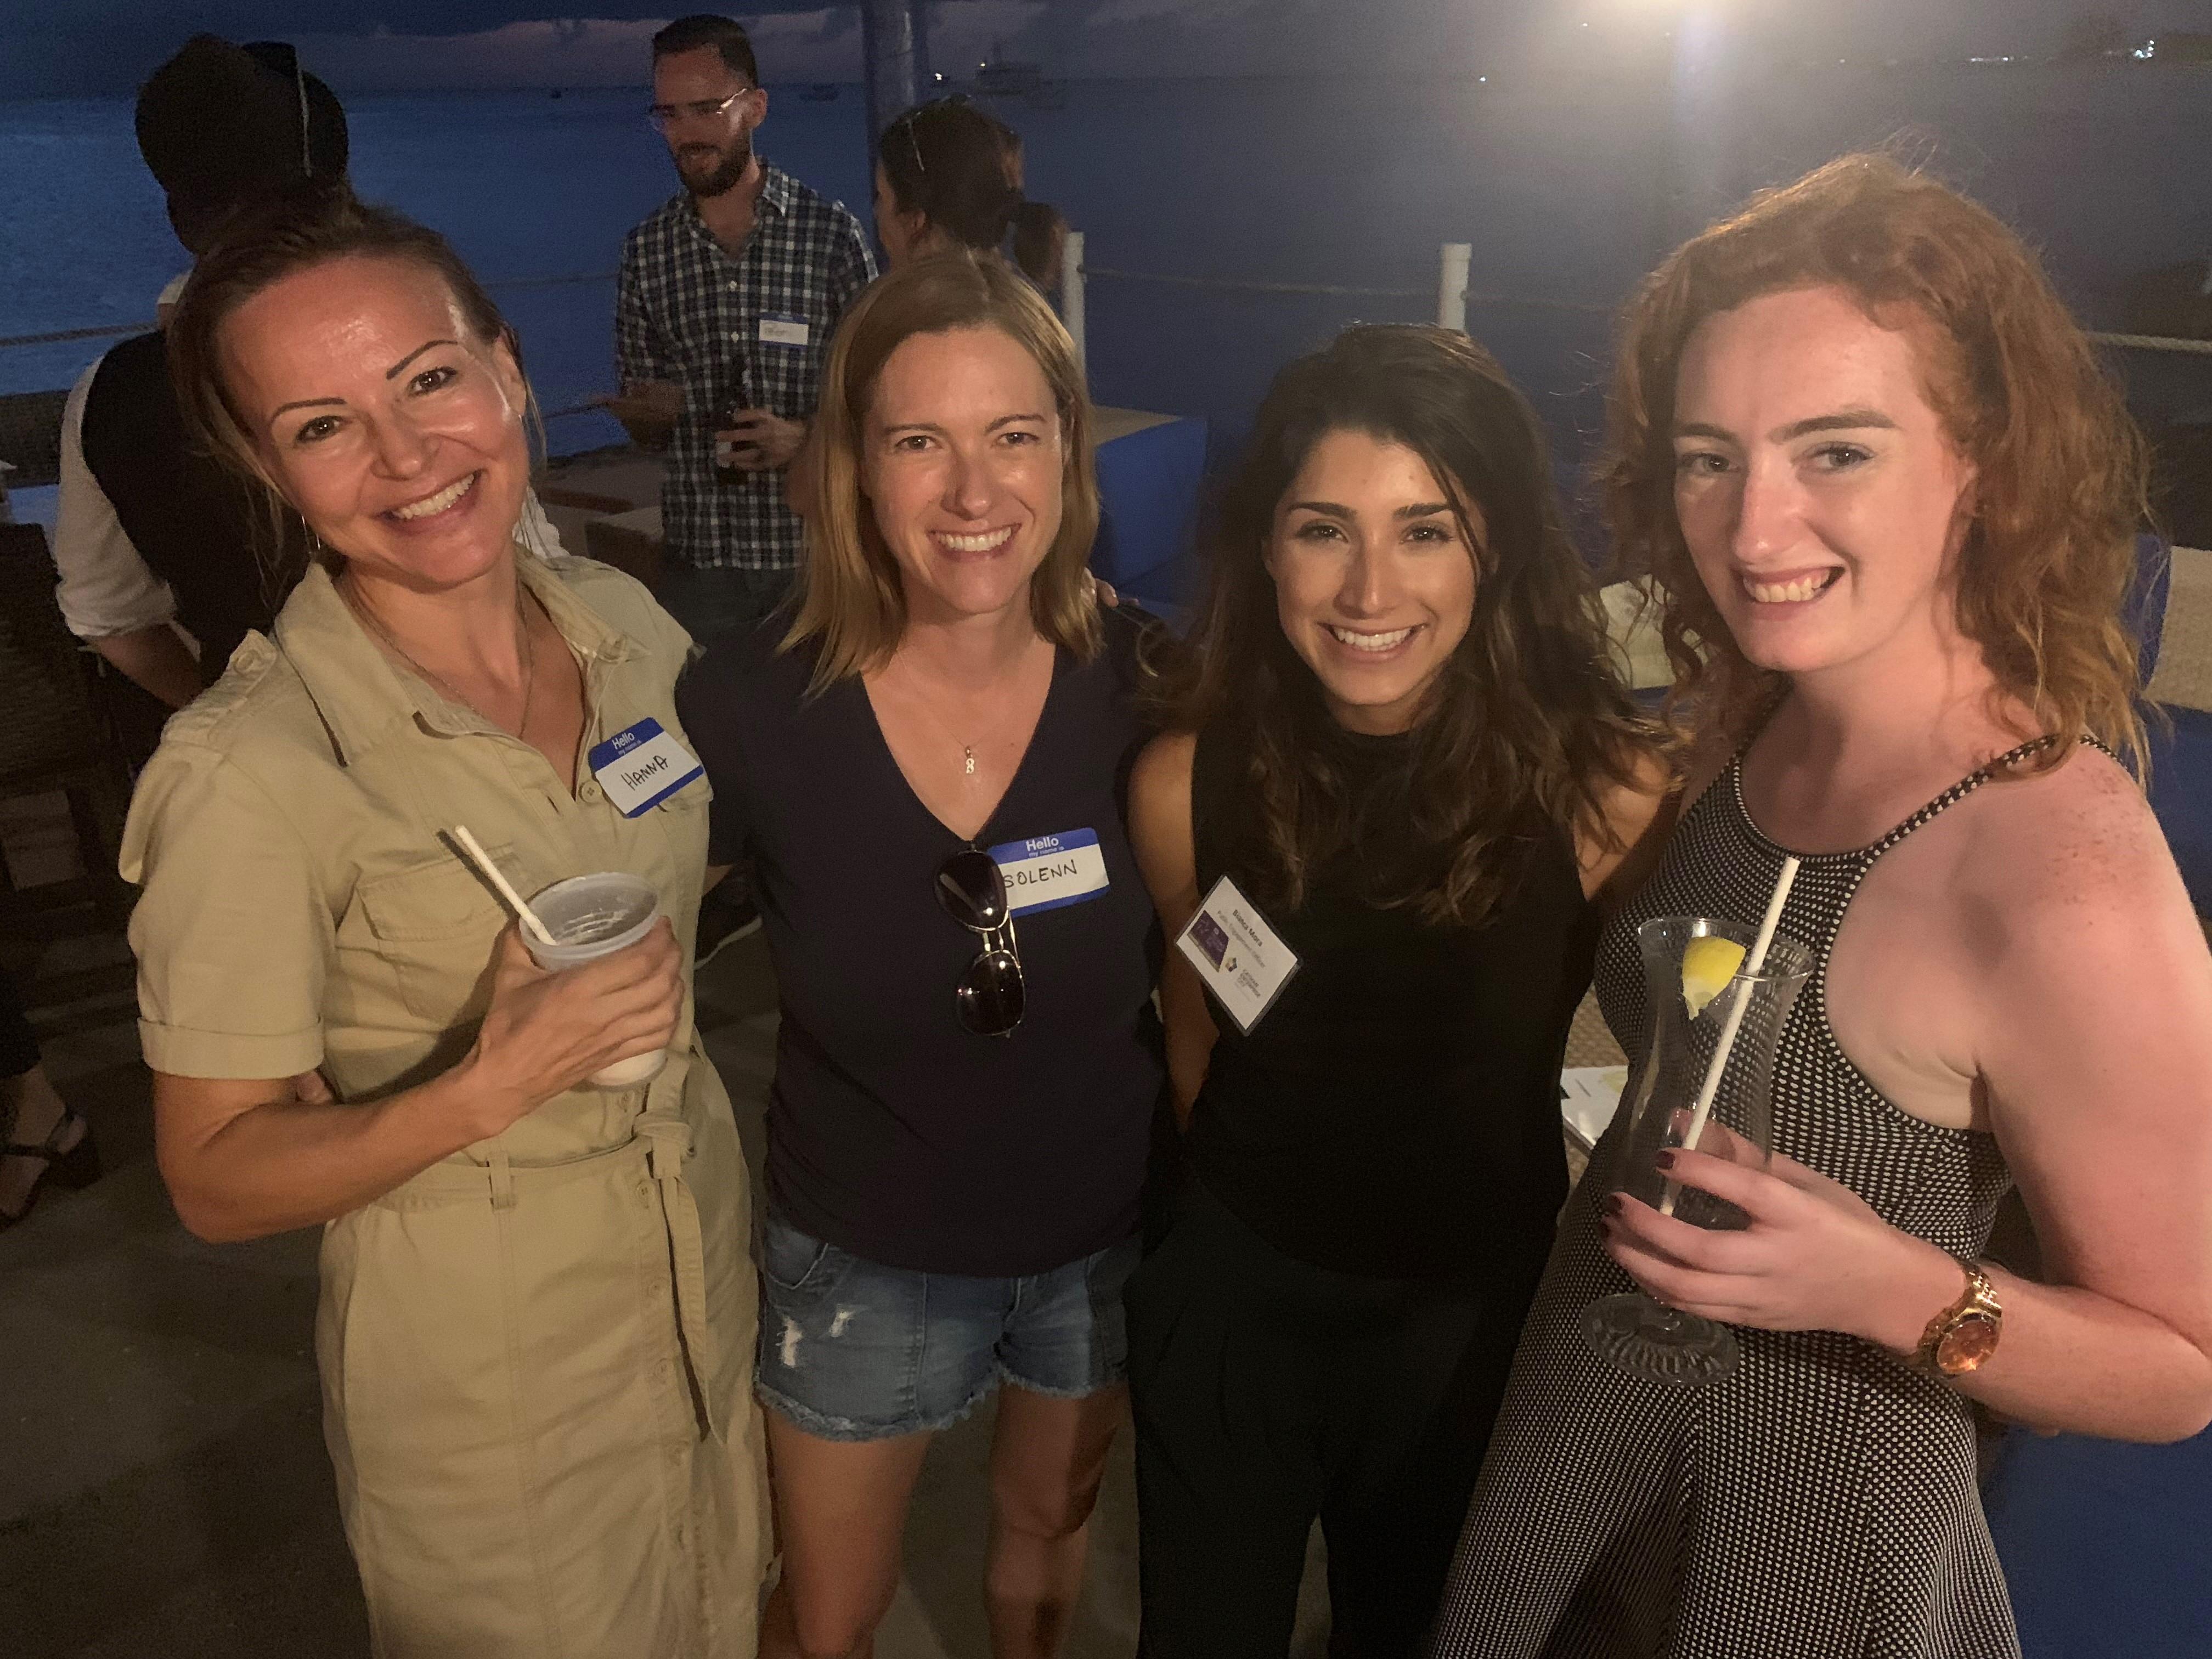 Hannah Walerjanczyk, Solenn Carriou, Bianca Mora, and Claire Murray